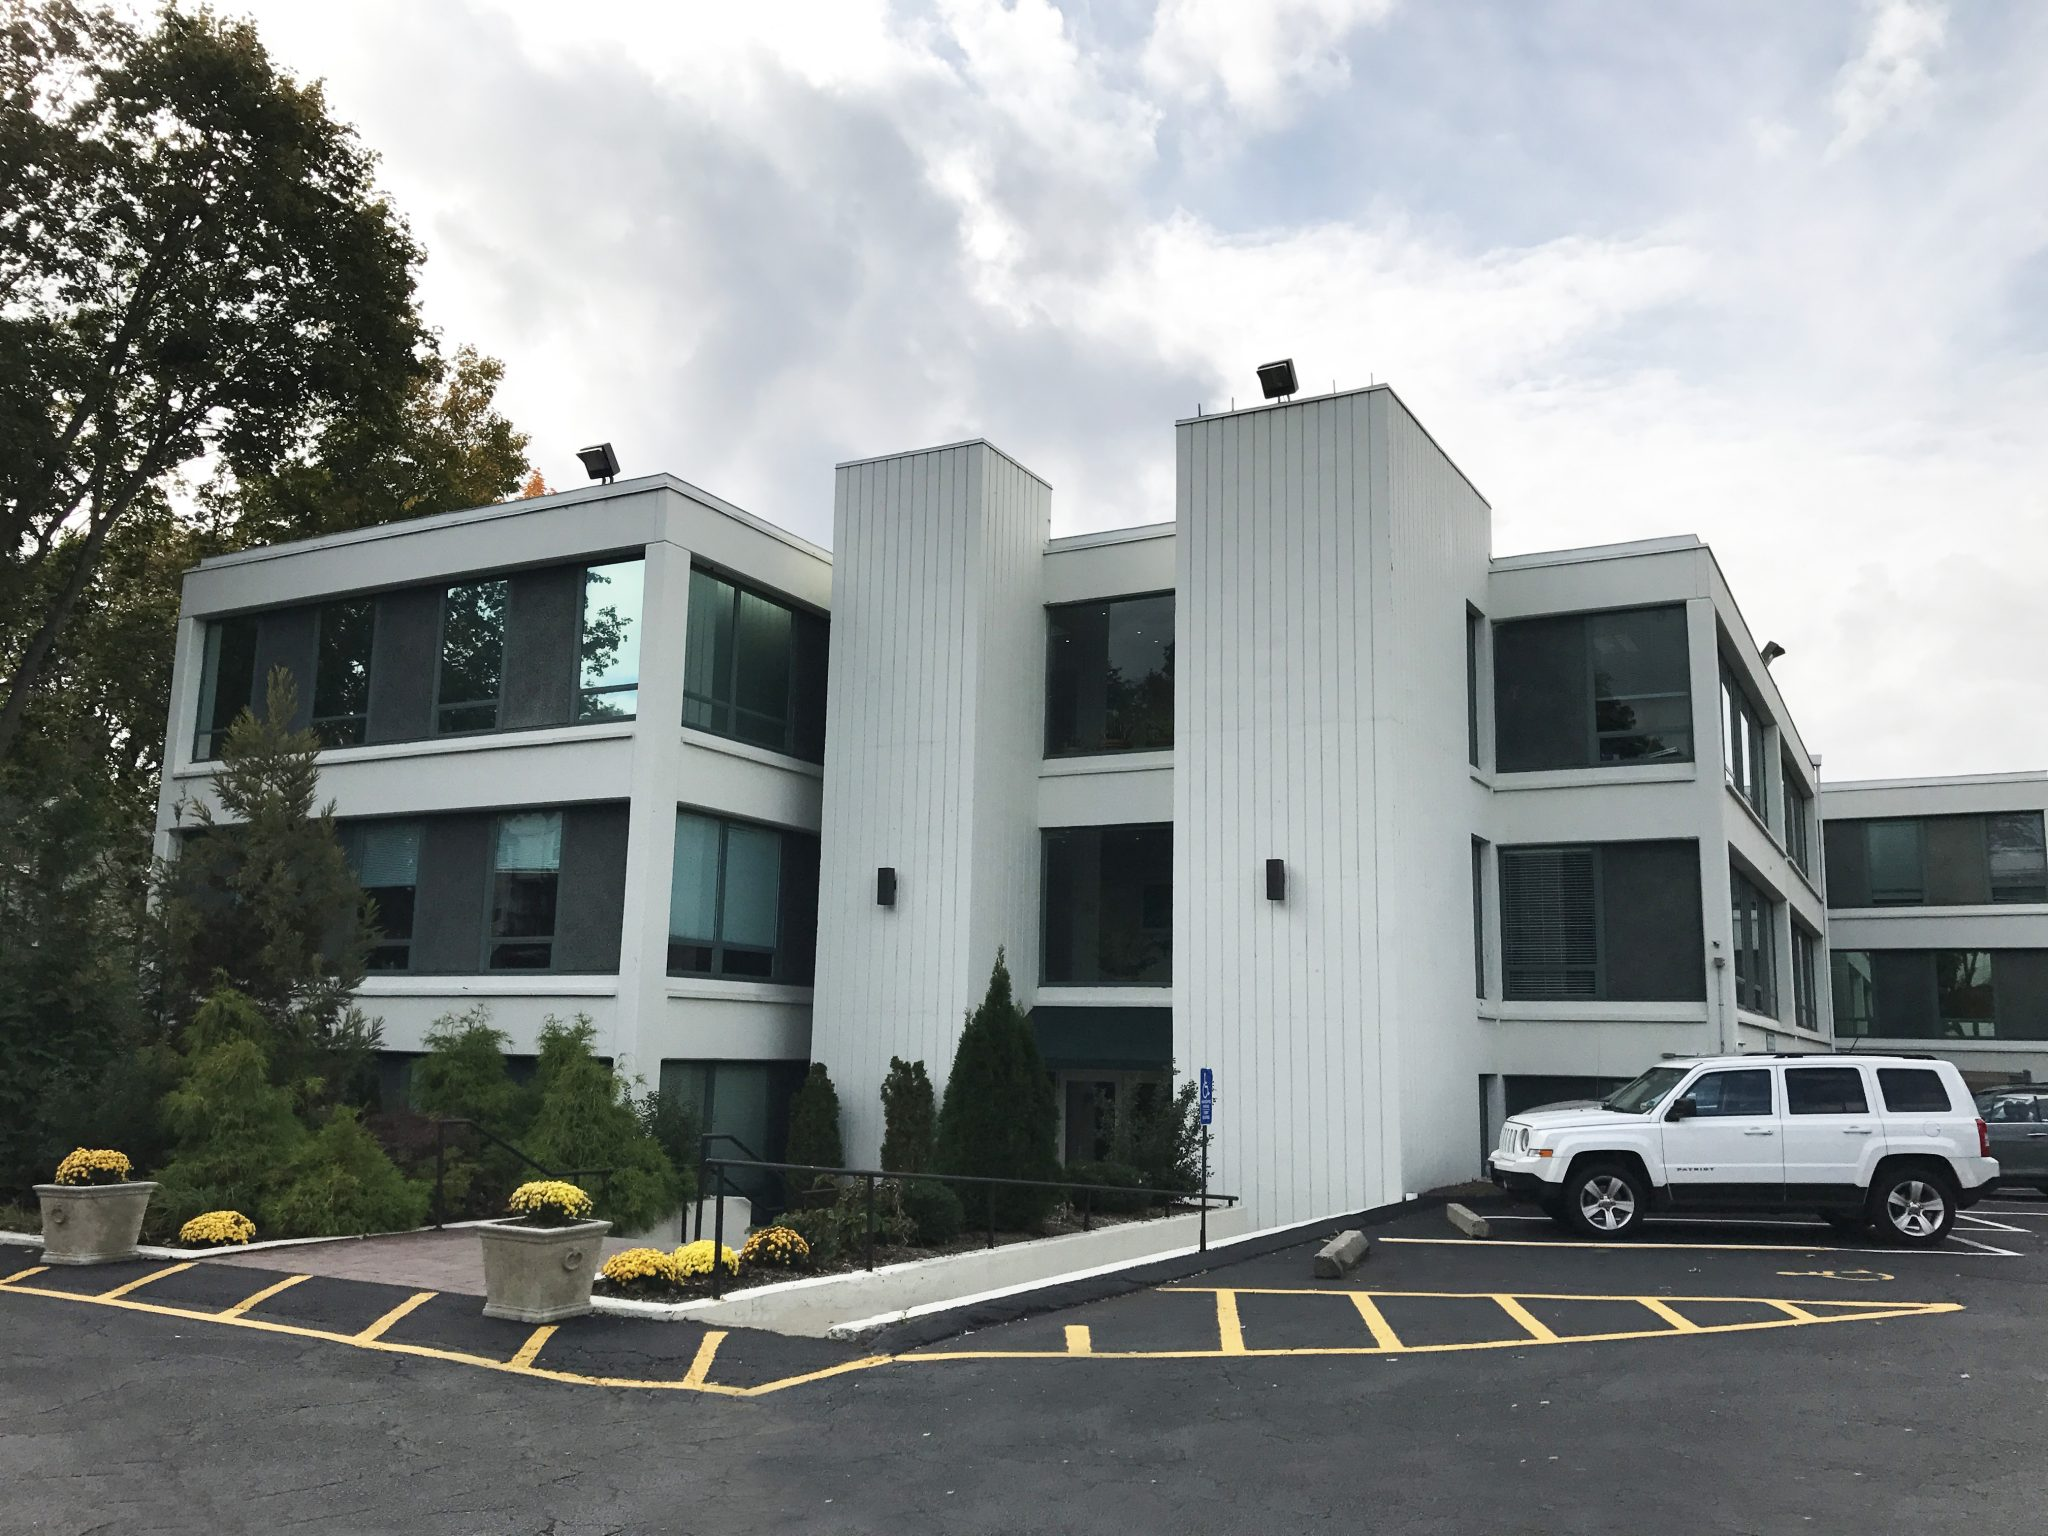 83 East Avenue – Norwalk, CT 06851 – 1,805 sq. ft.